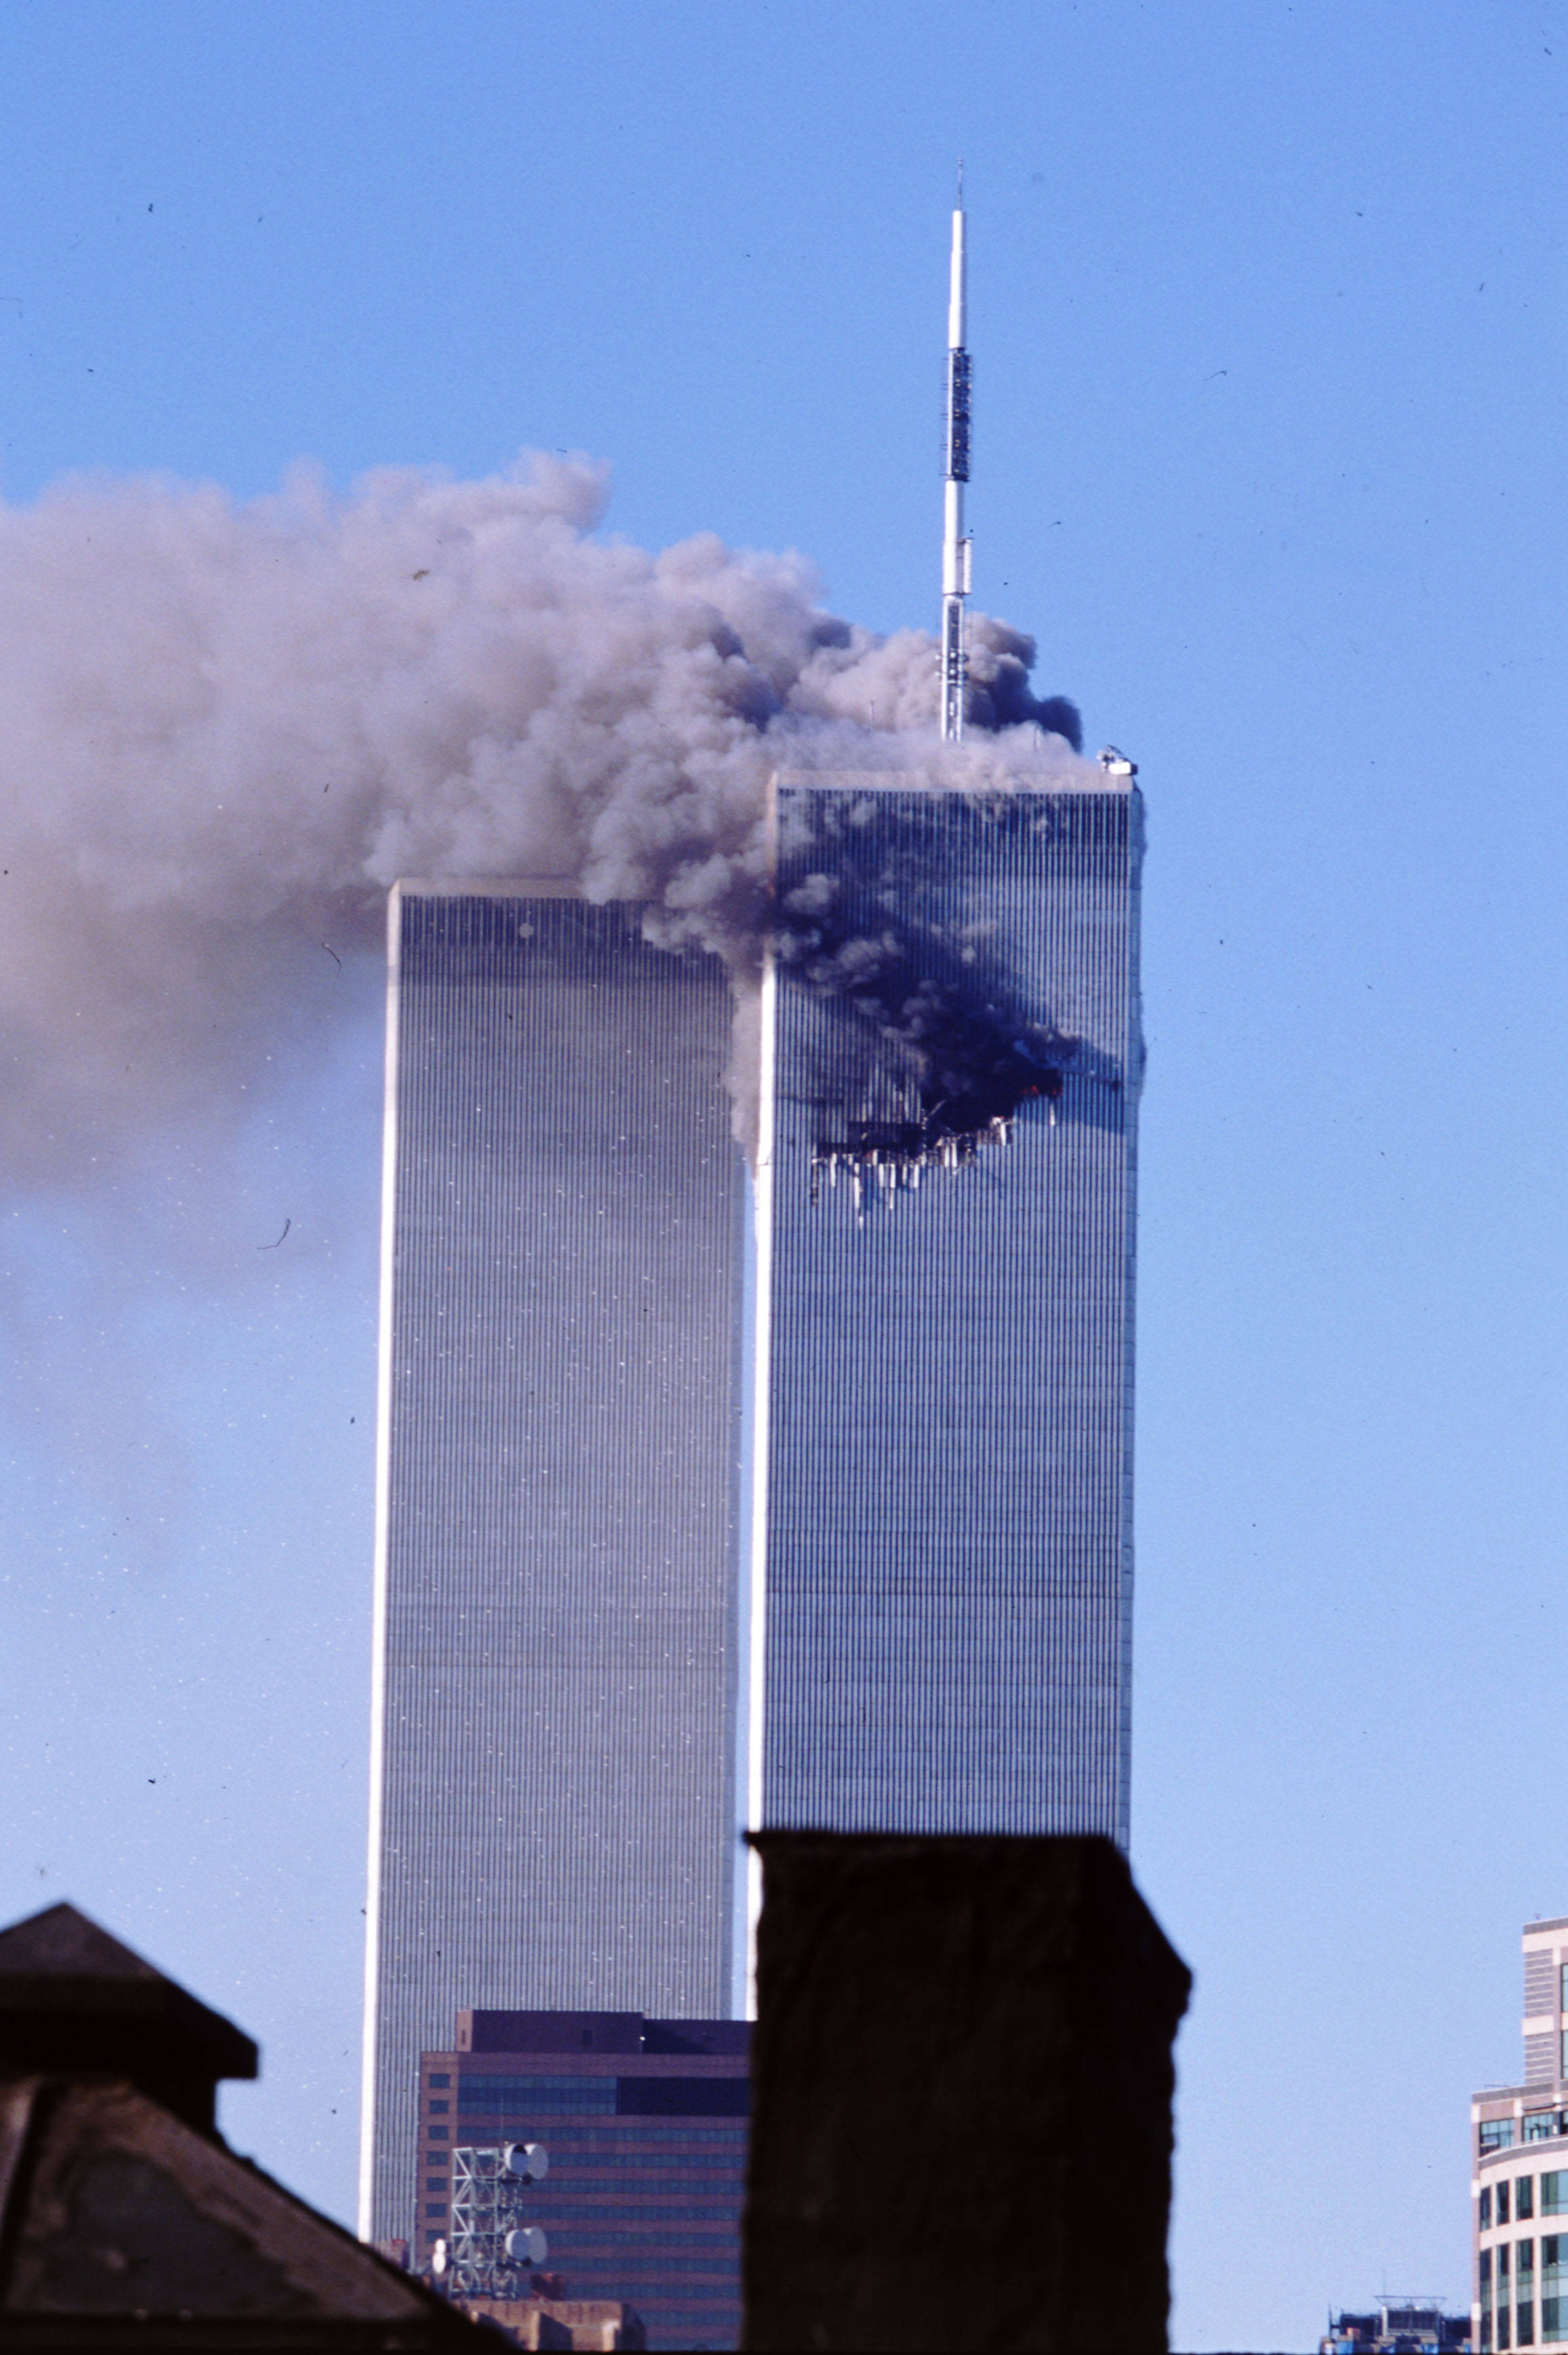 Terroranschläge am 11 September 2001  Wikipedia